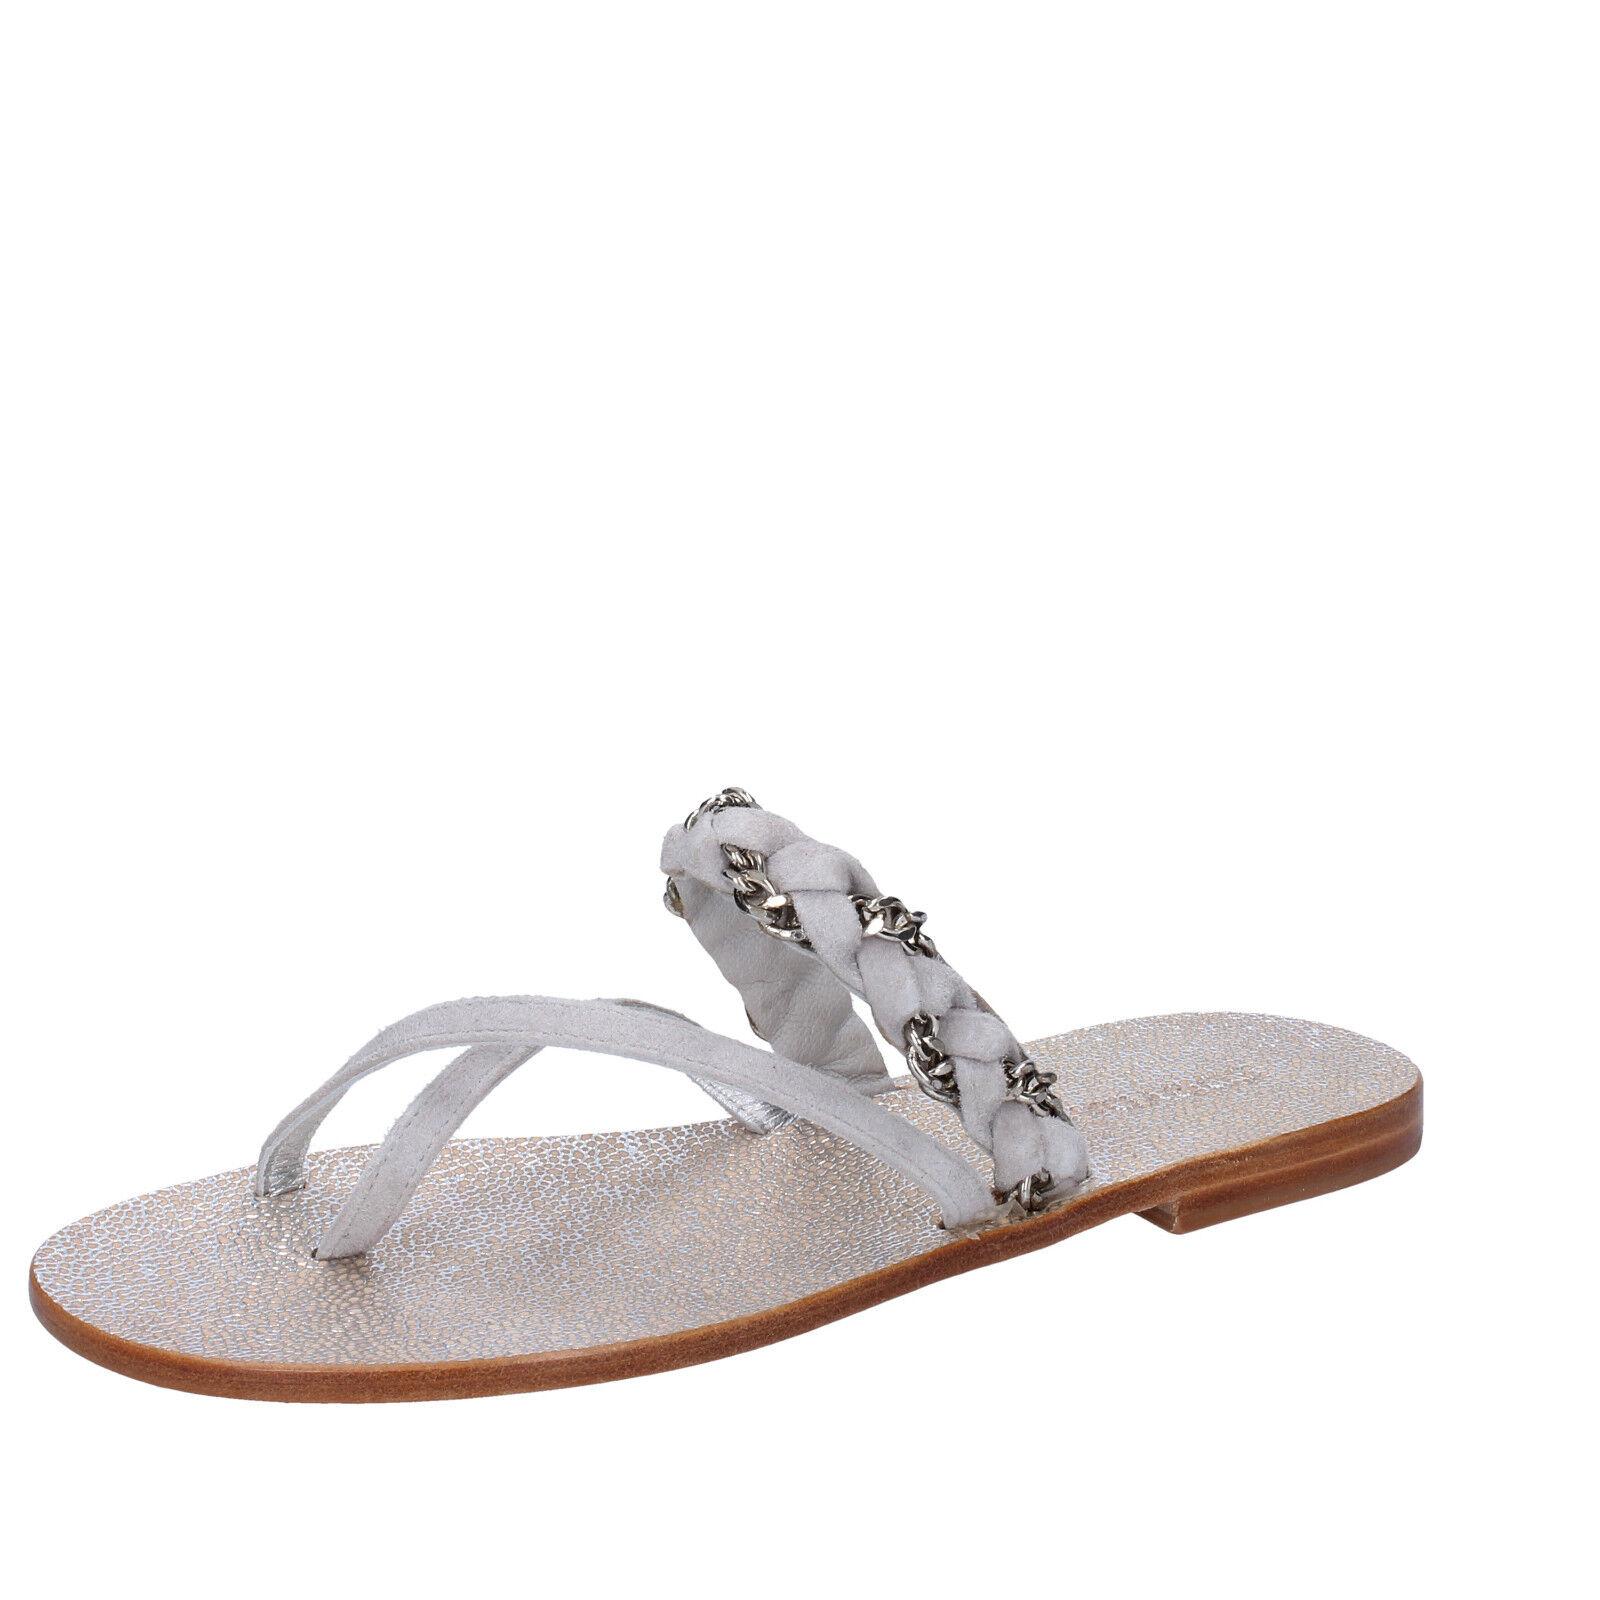 Scarpe donna EDDY DANIELE 37 EU sandali grigio camoscio AW309